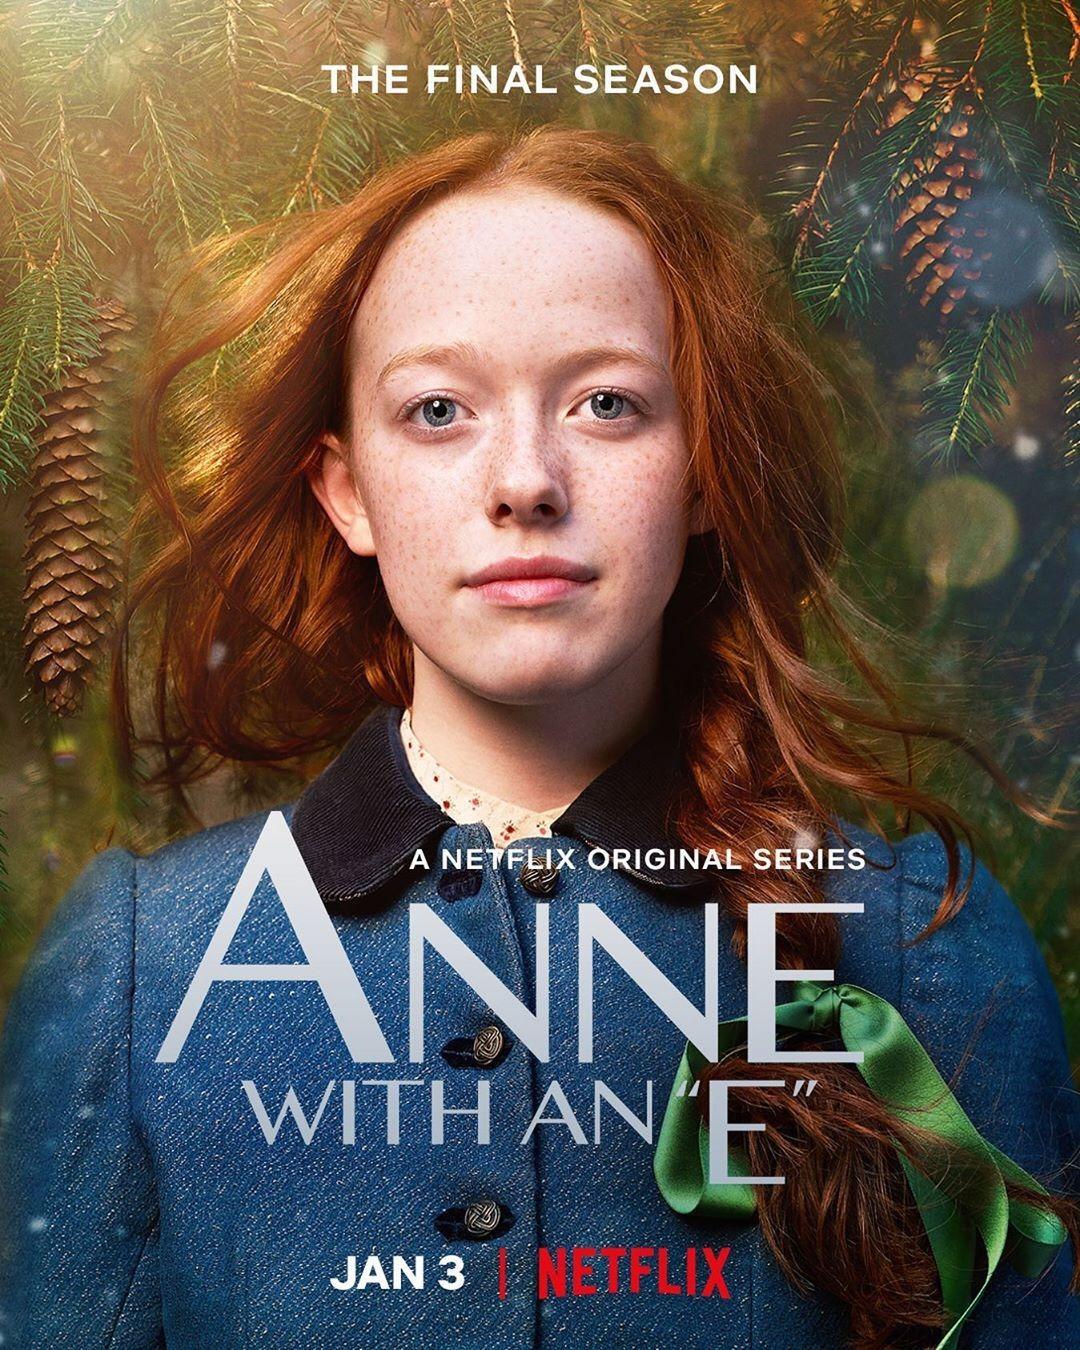 Anne.S03E03.720p.WEBRip.x264-CookieMonster